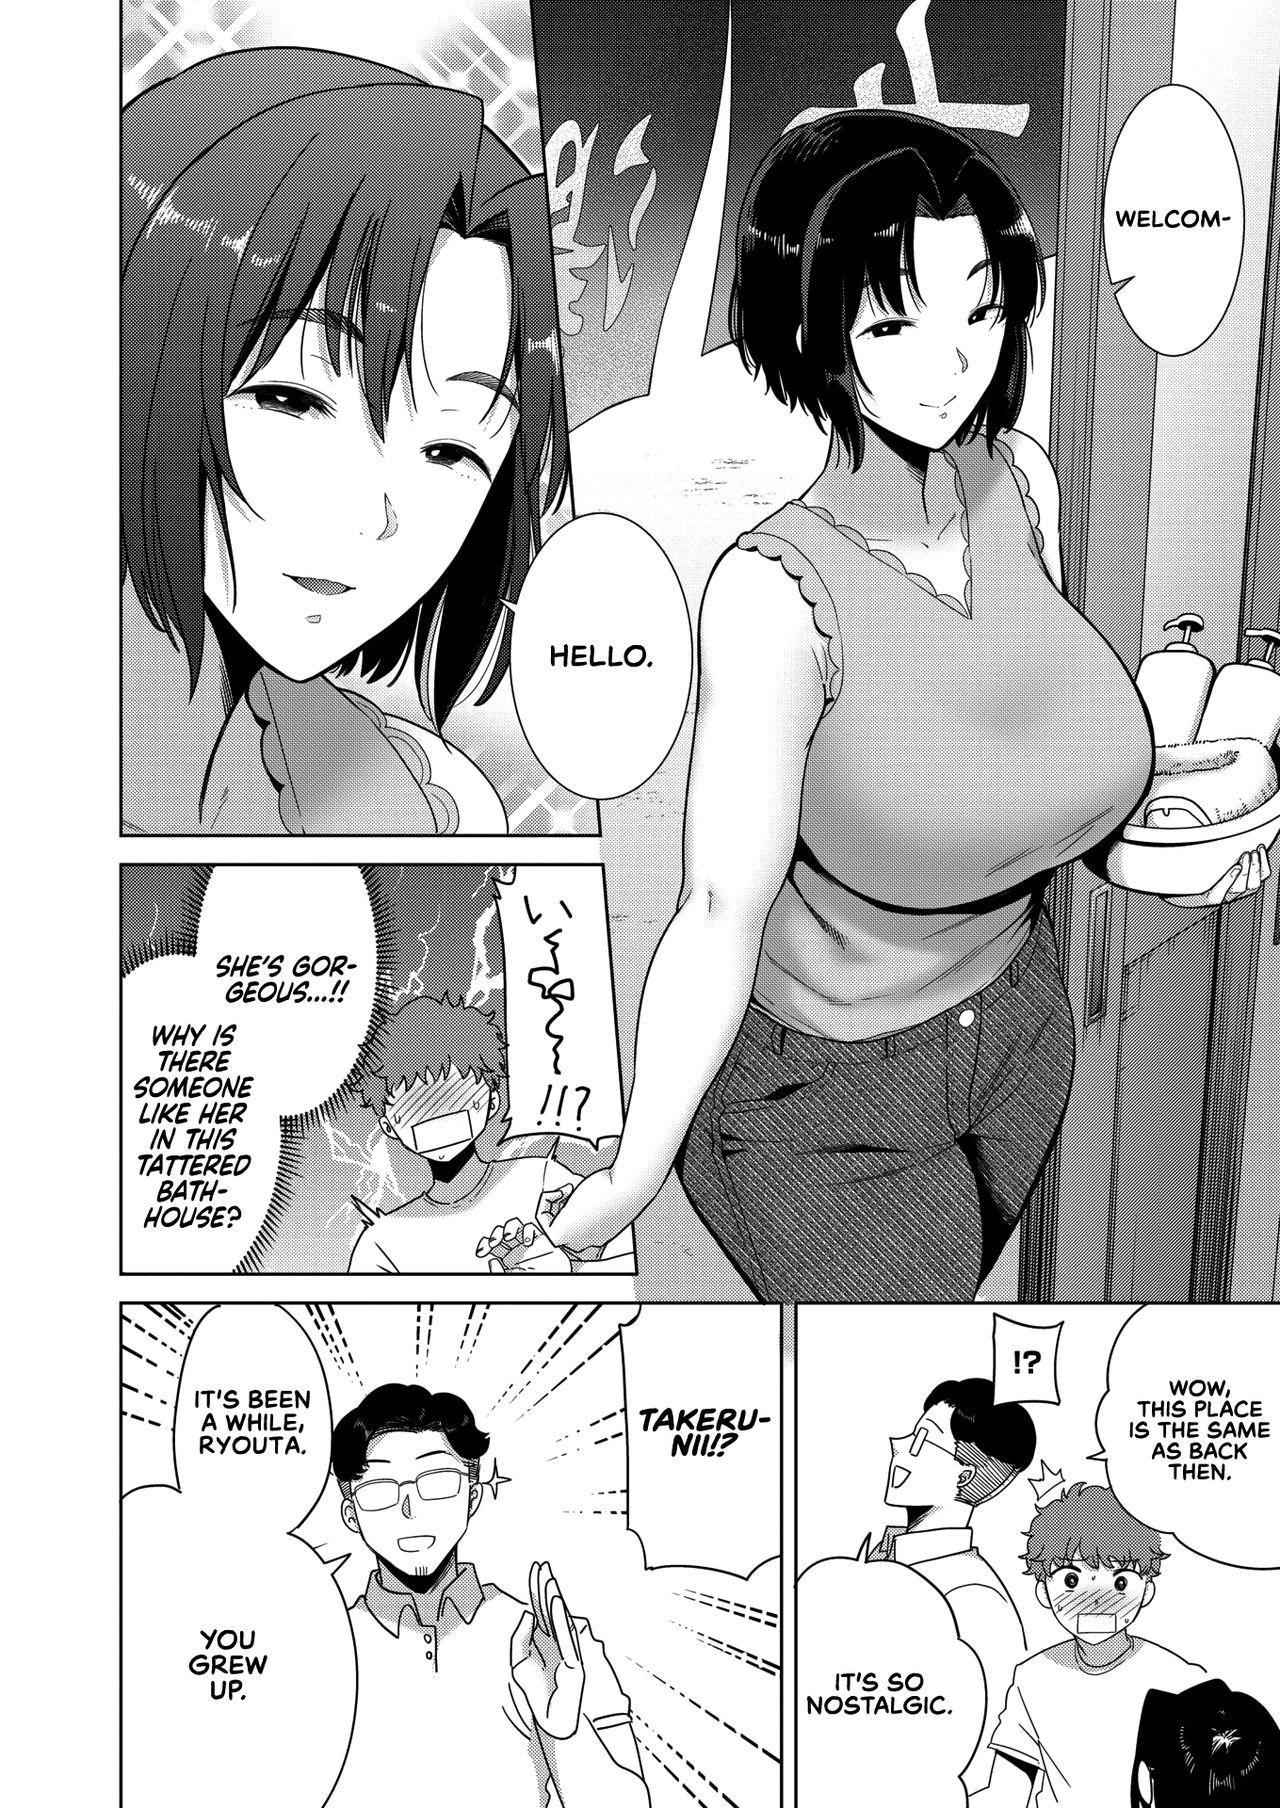 [Kurosu Gatari] Bandai-kun to Onee-san | Bath Attendant-kun and Onee-san (COMIC HOTMILK 2020-08) [English] [Coffedrug+RedLantern] [Digital] 1